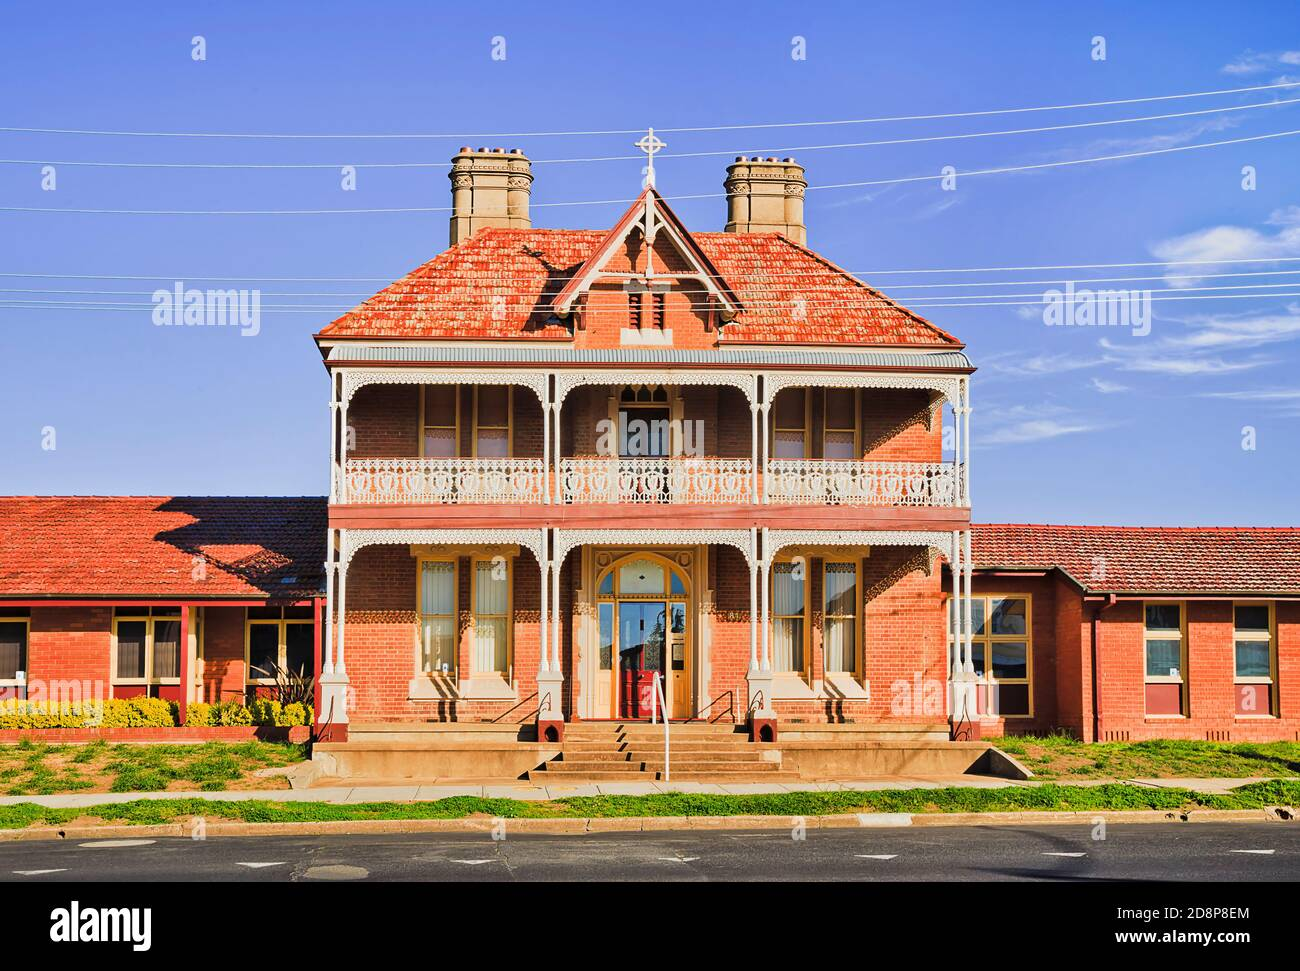 George street in Bathurst city of Australia - historic brick house facade along the road. Stock Photo